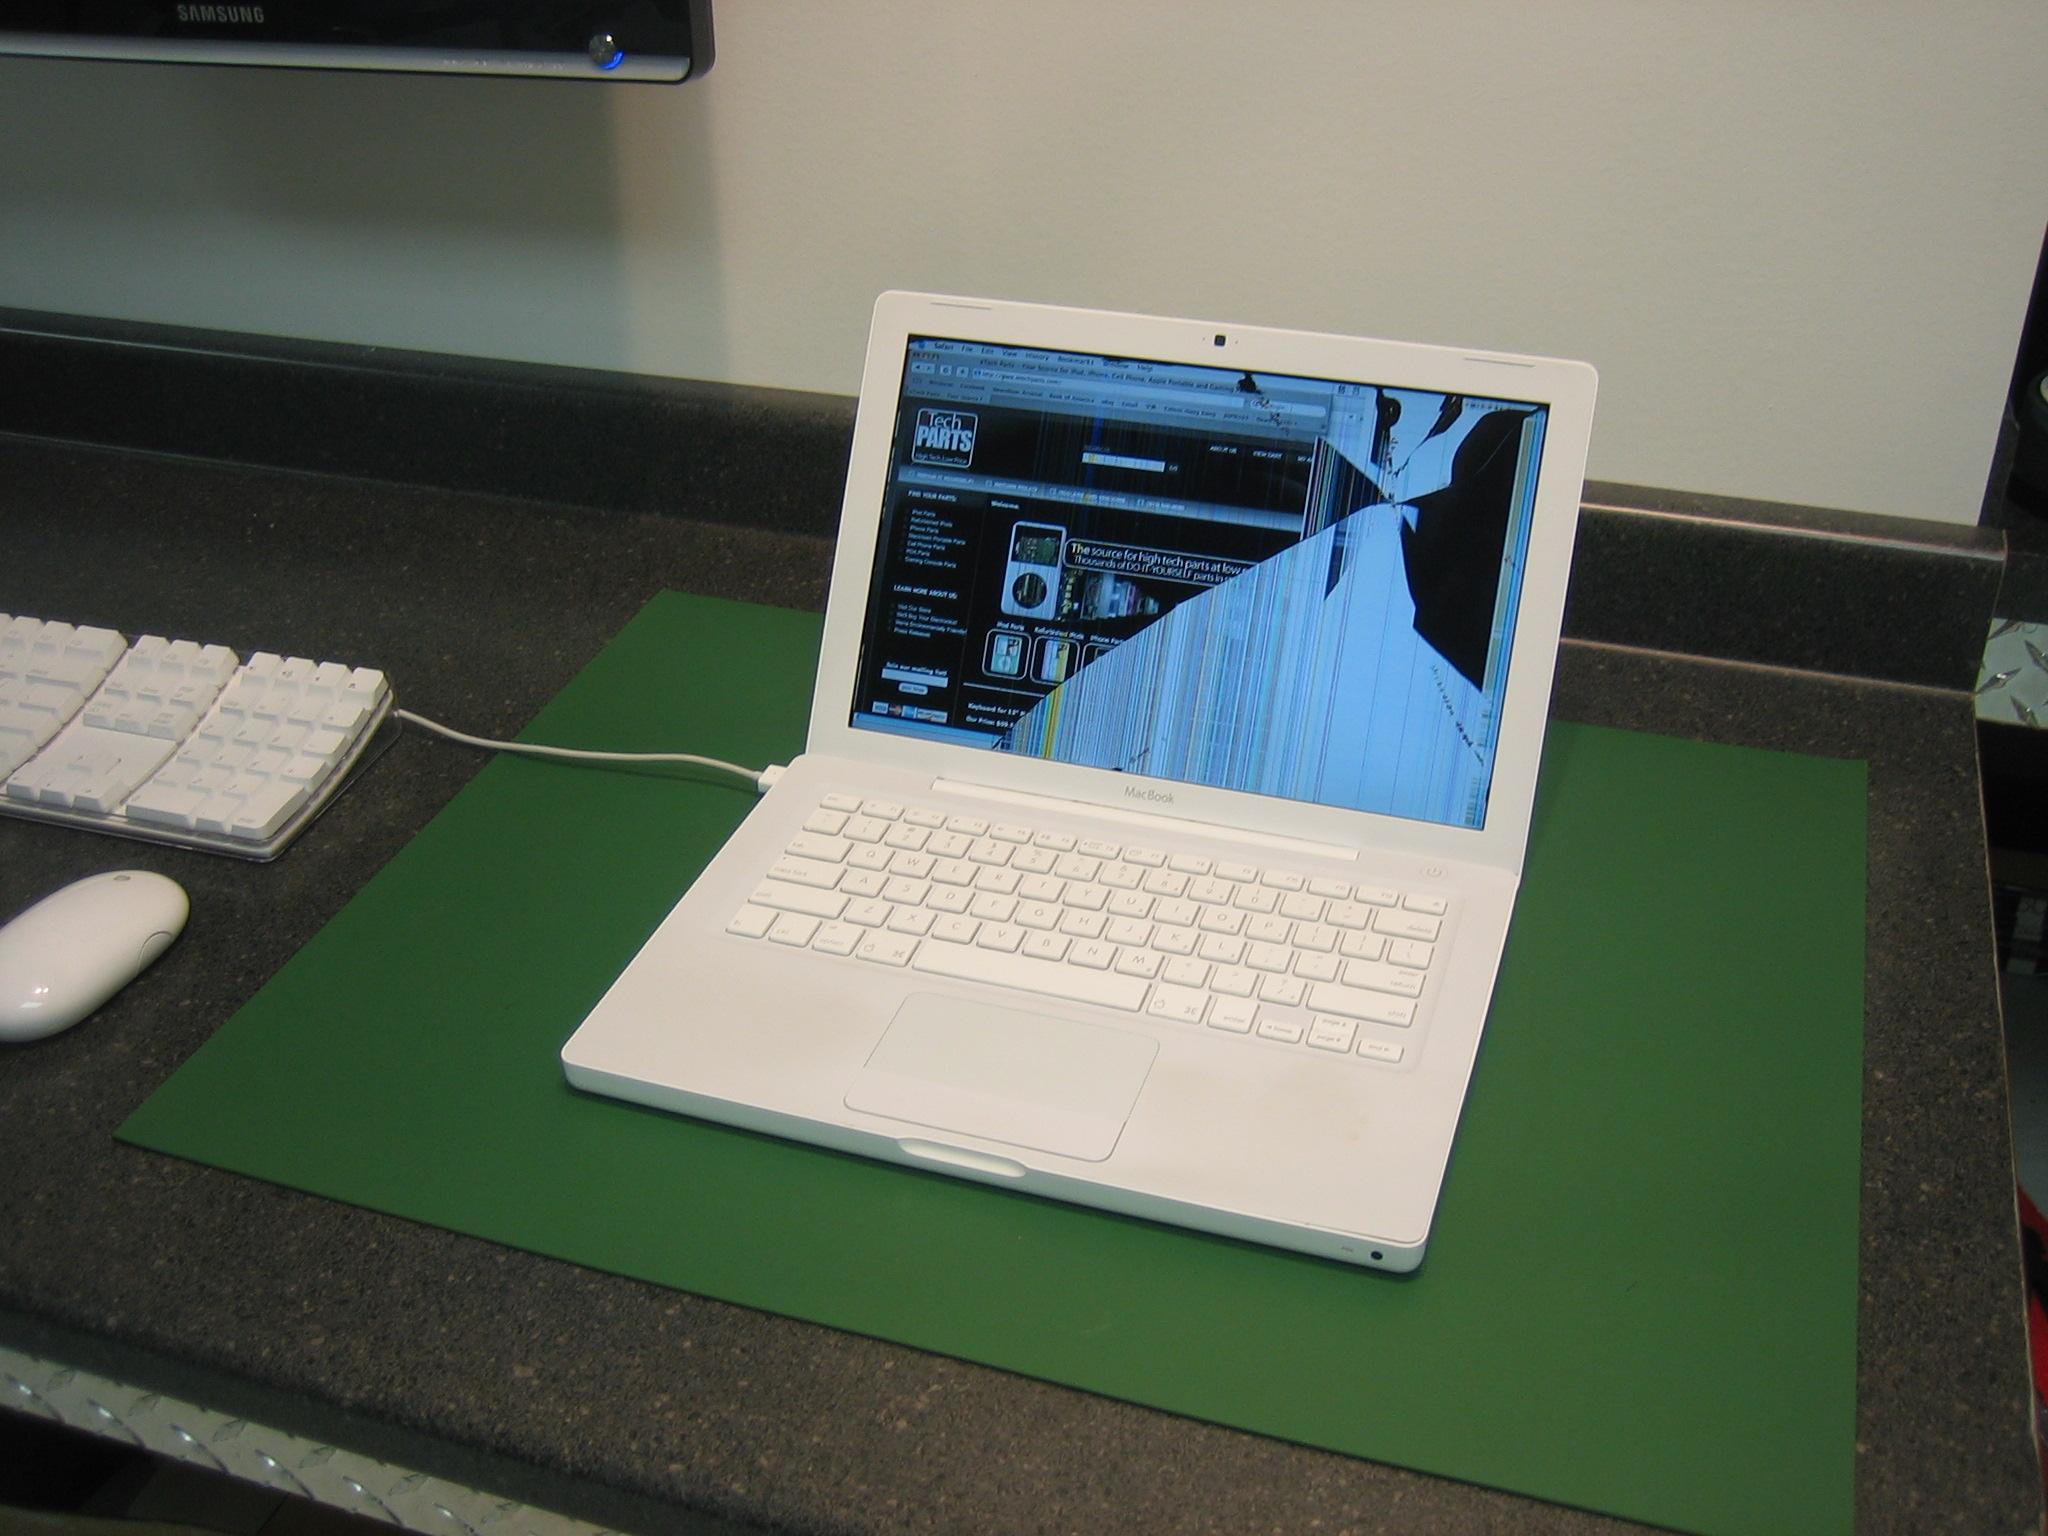 crack macbook screen